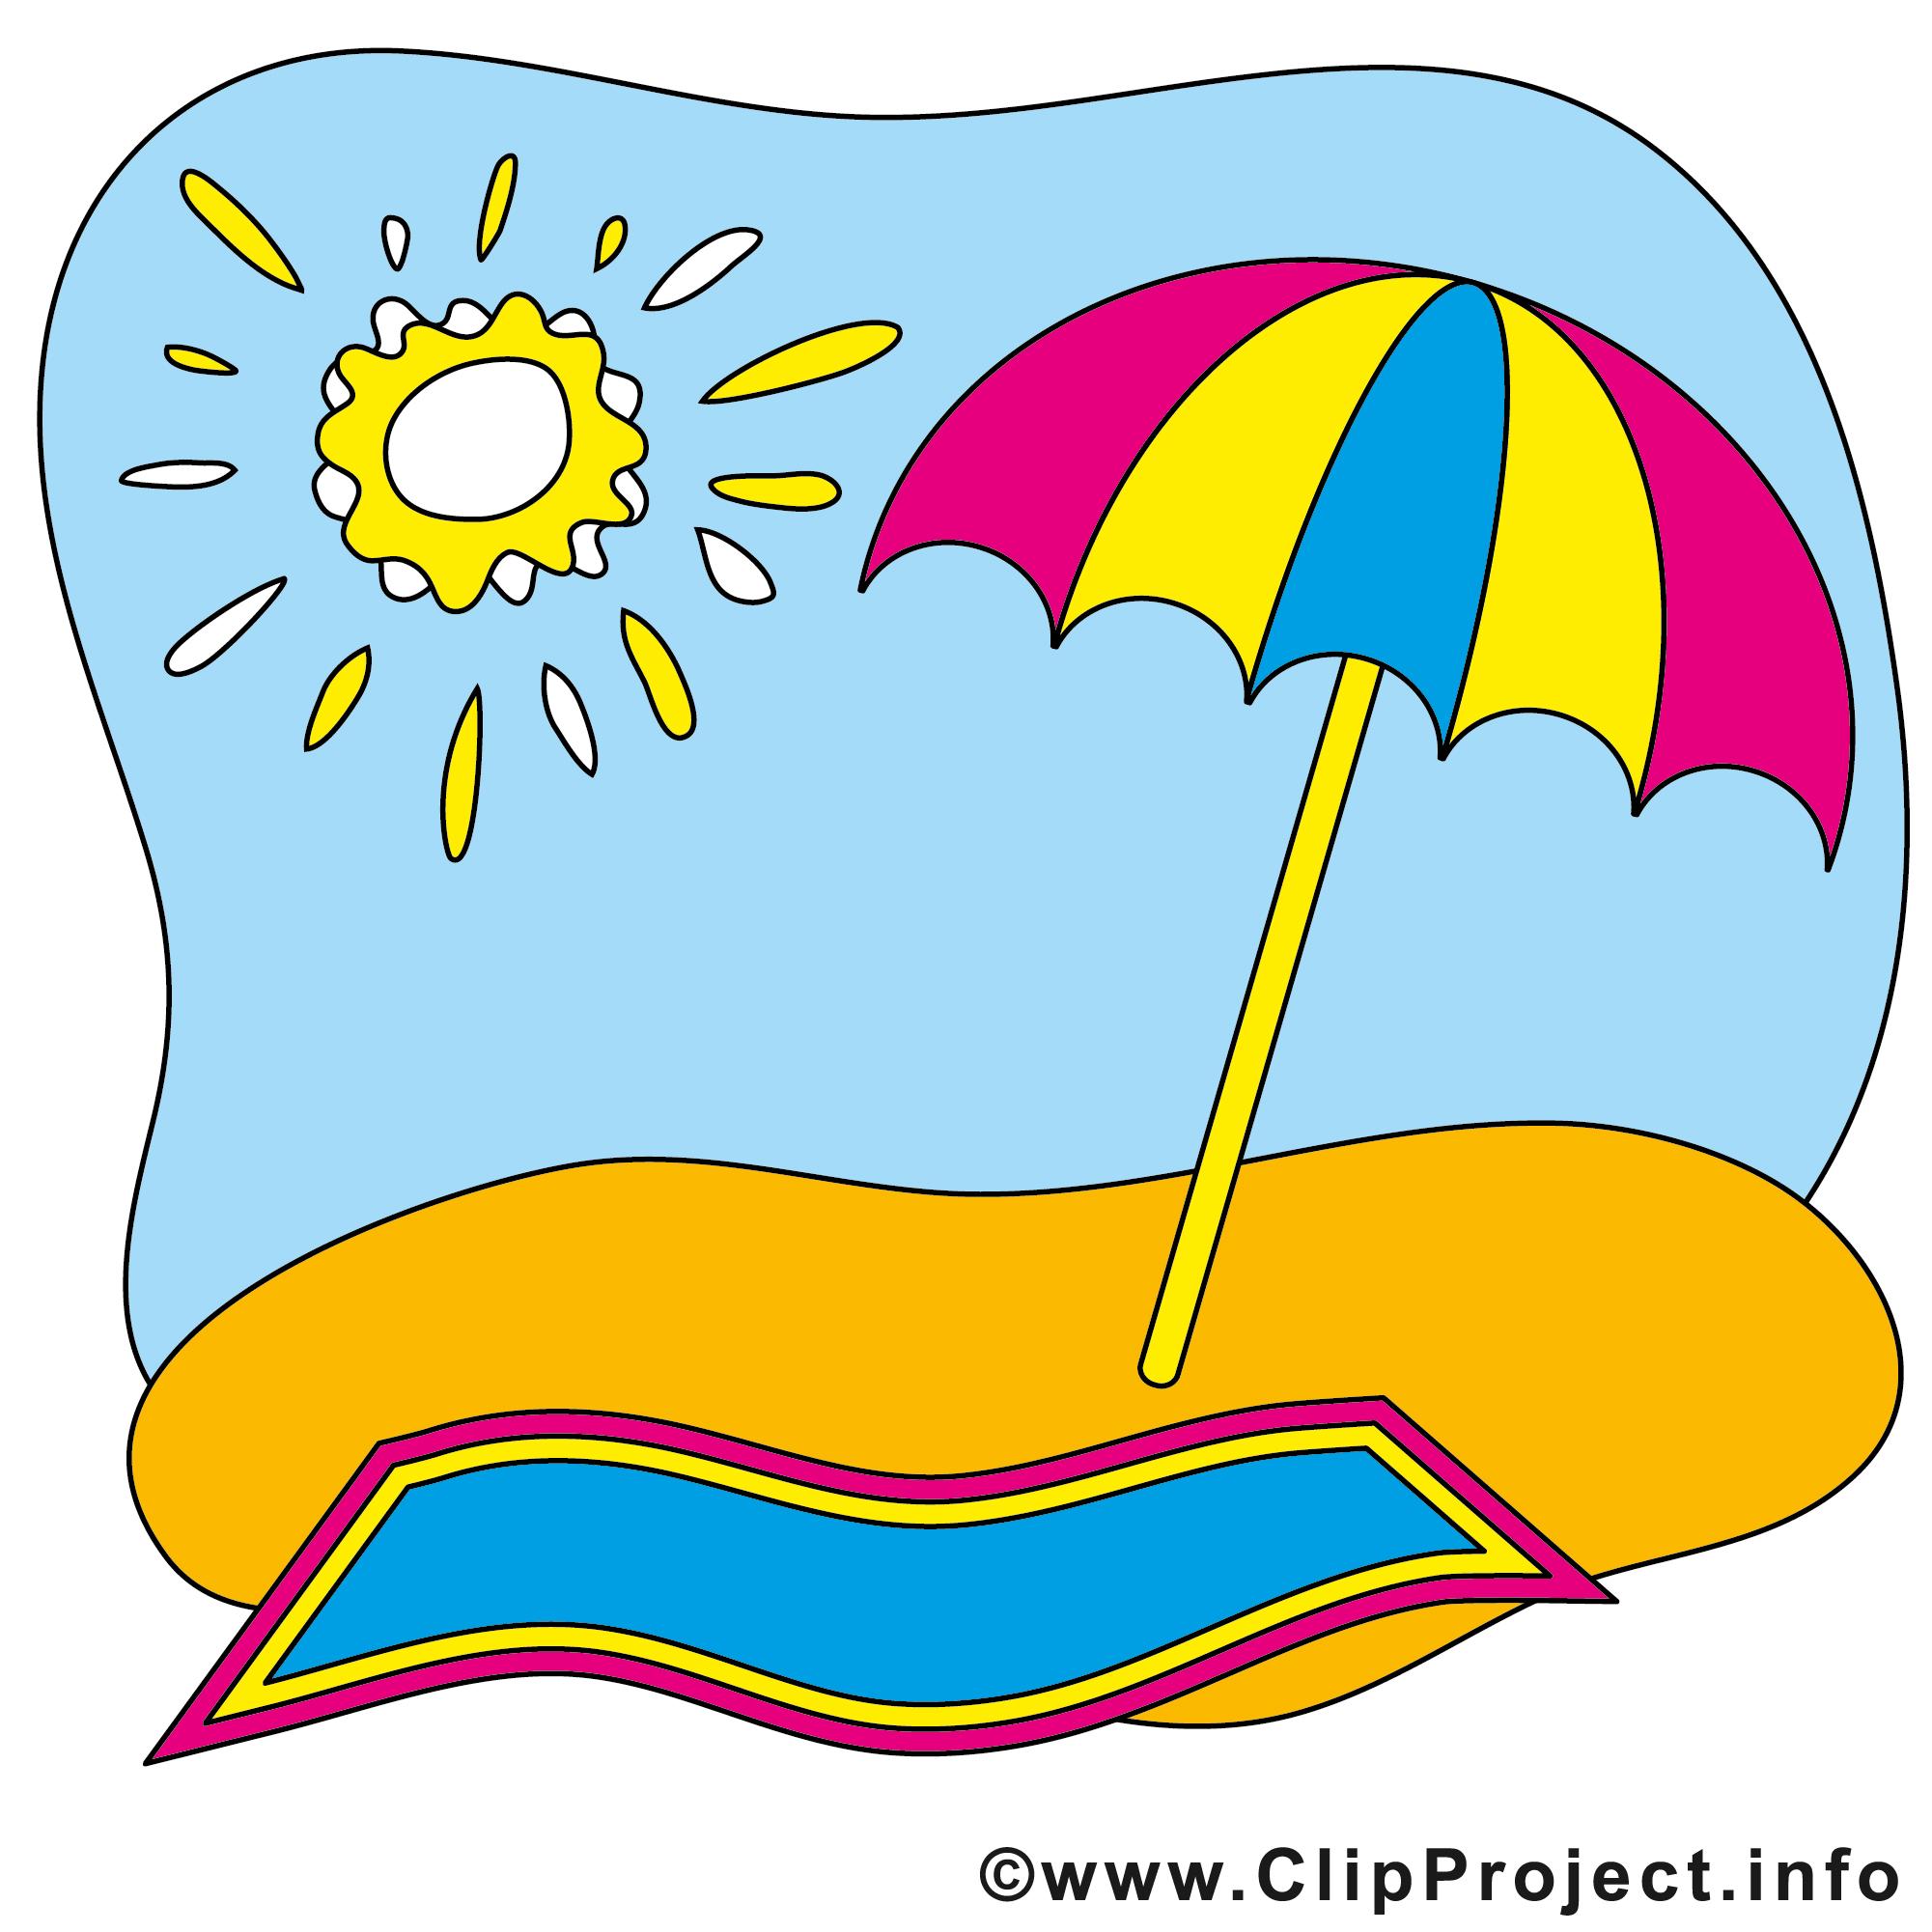 Bilder clipart clip art freeuse download Clipart sommer - ClipartFest clip art freeuse download